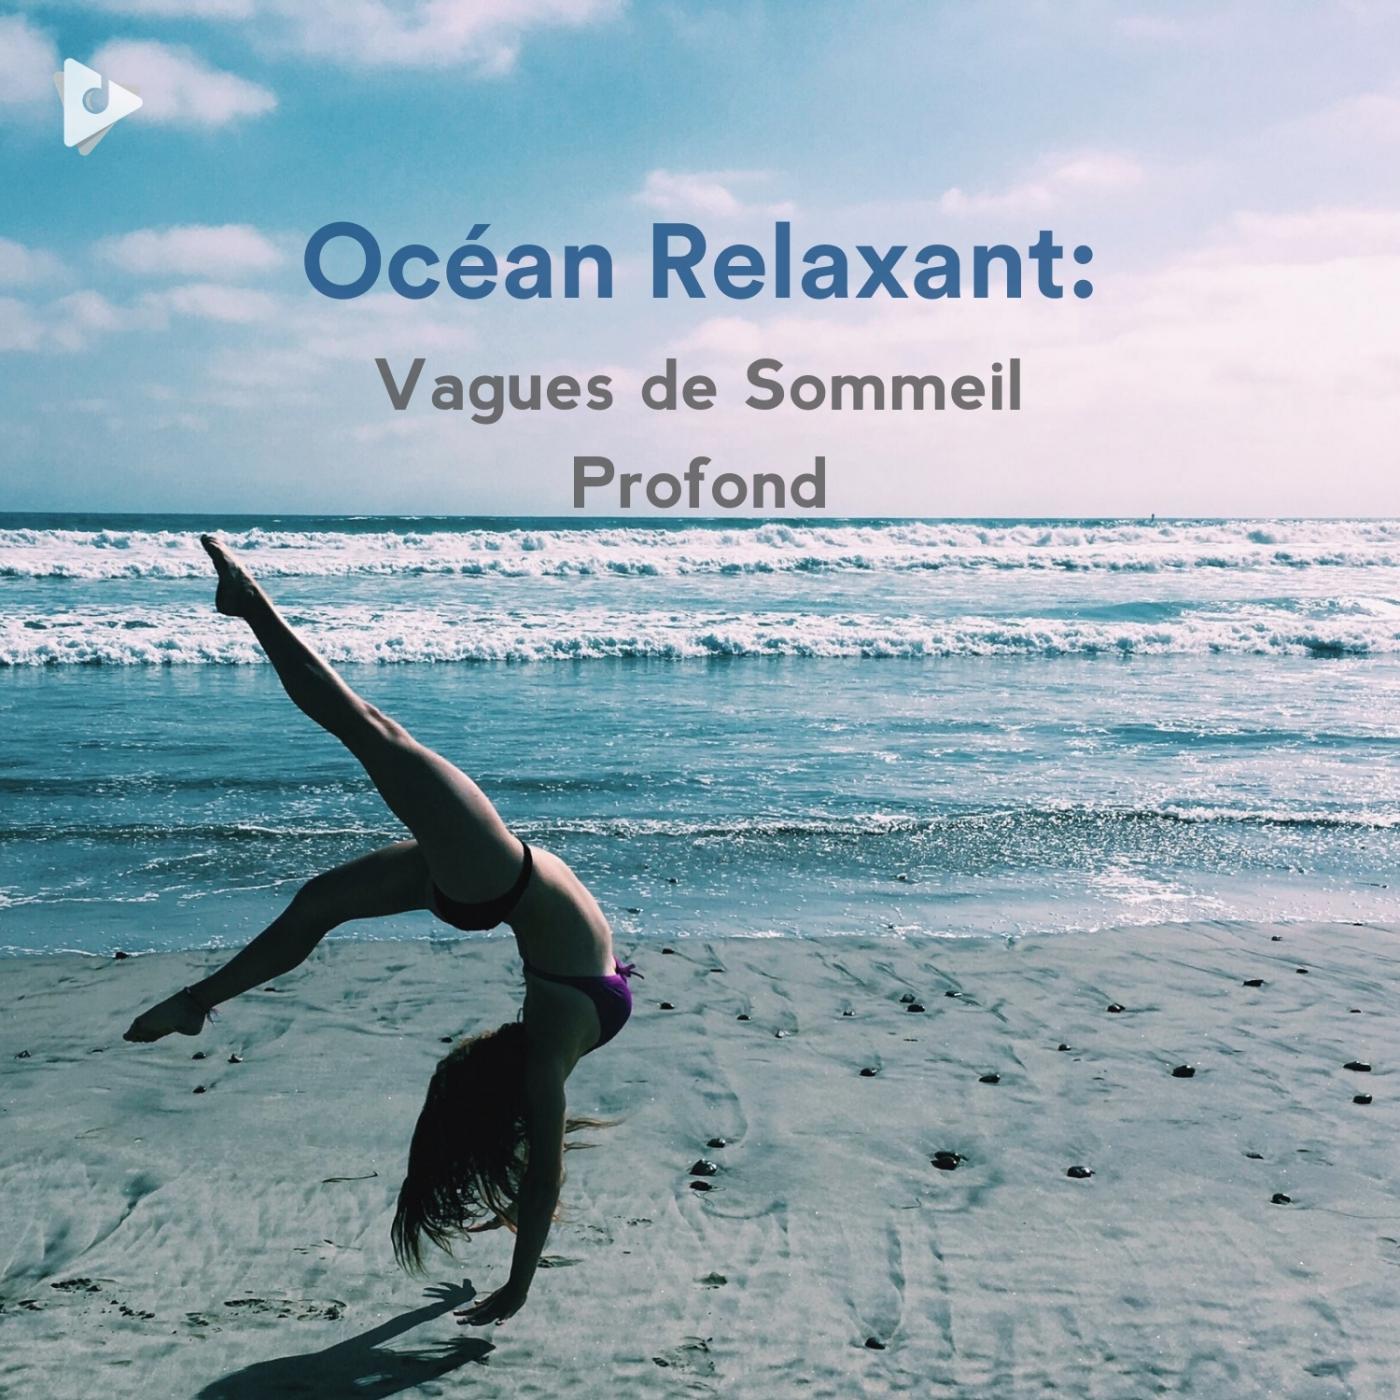 Océan Relaxant: Vagues de Sommeil Profond